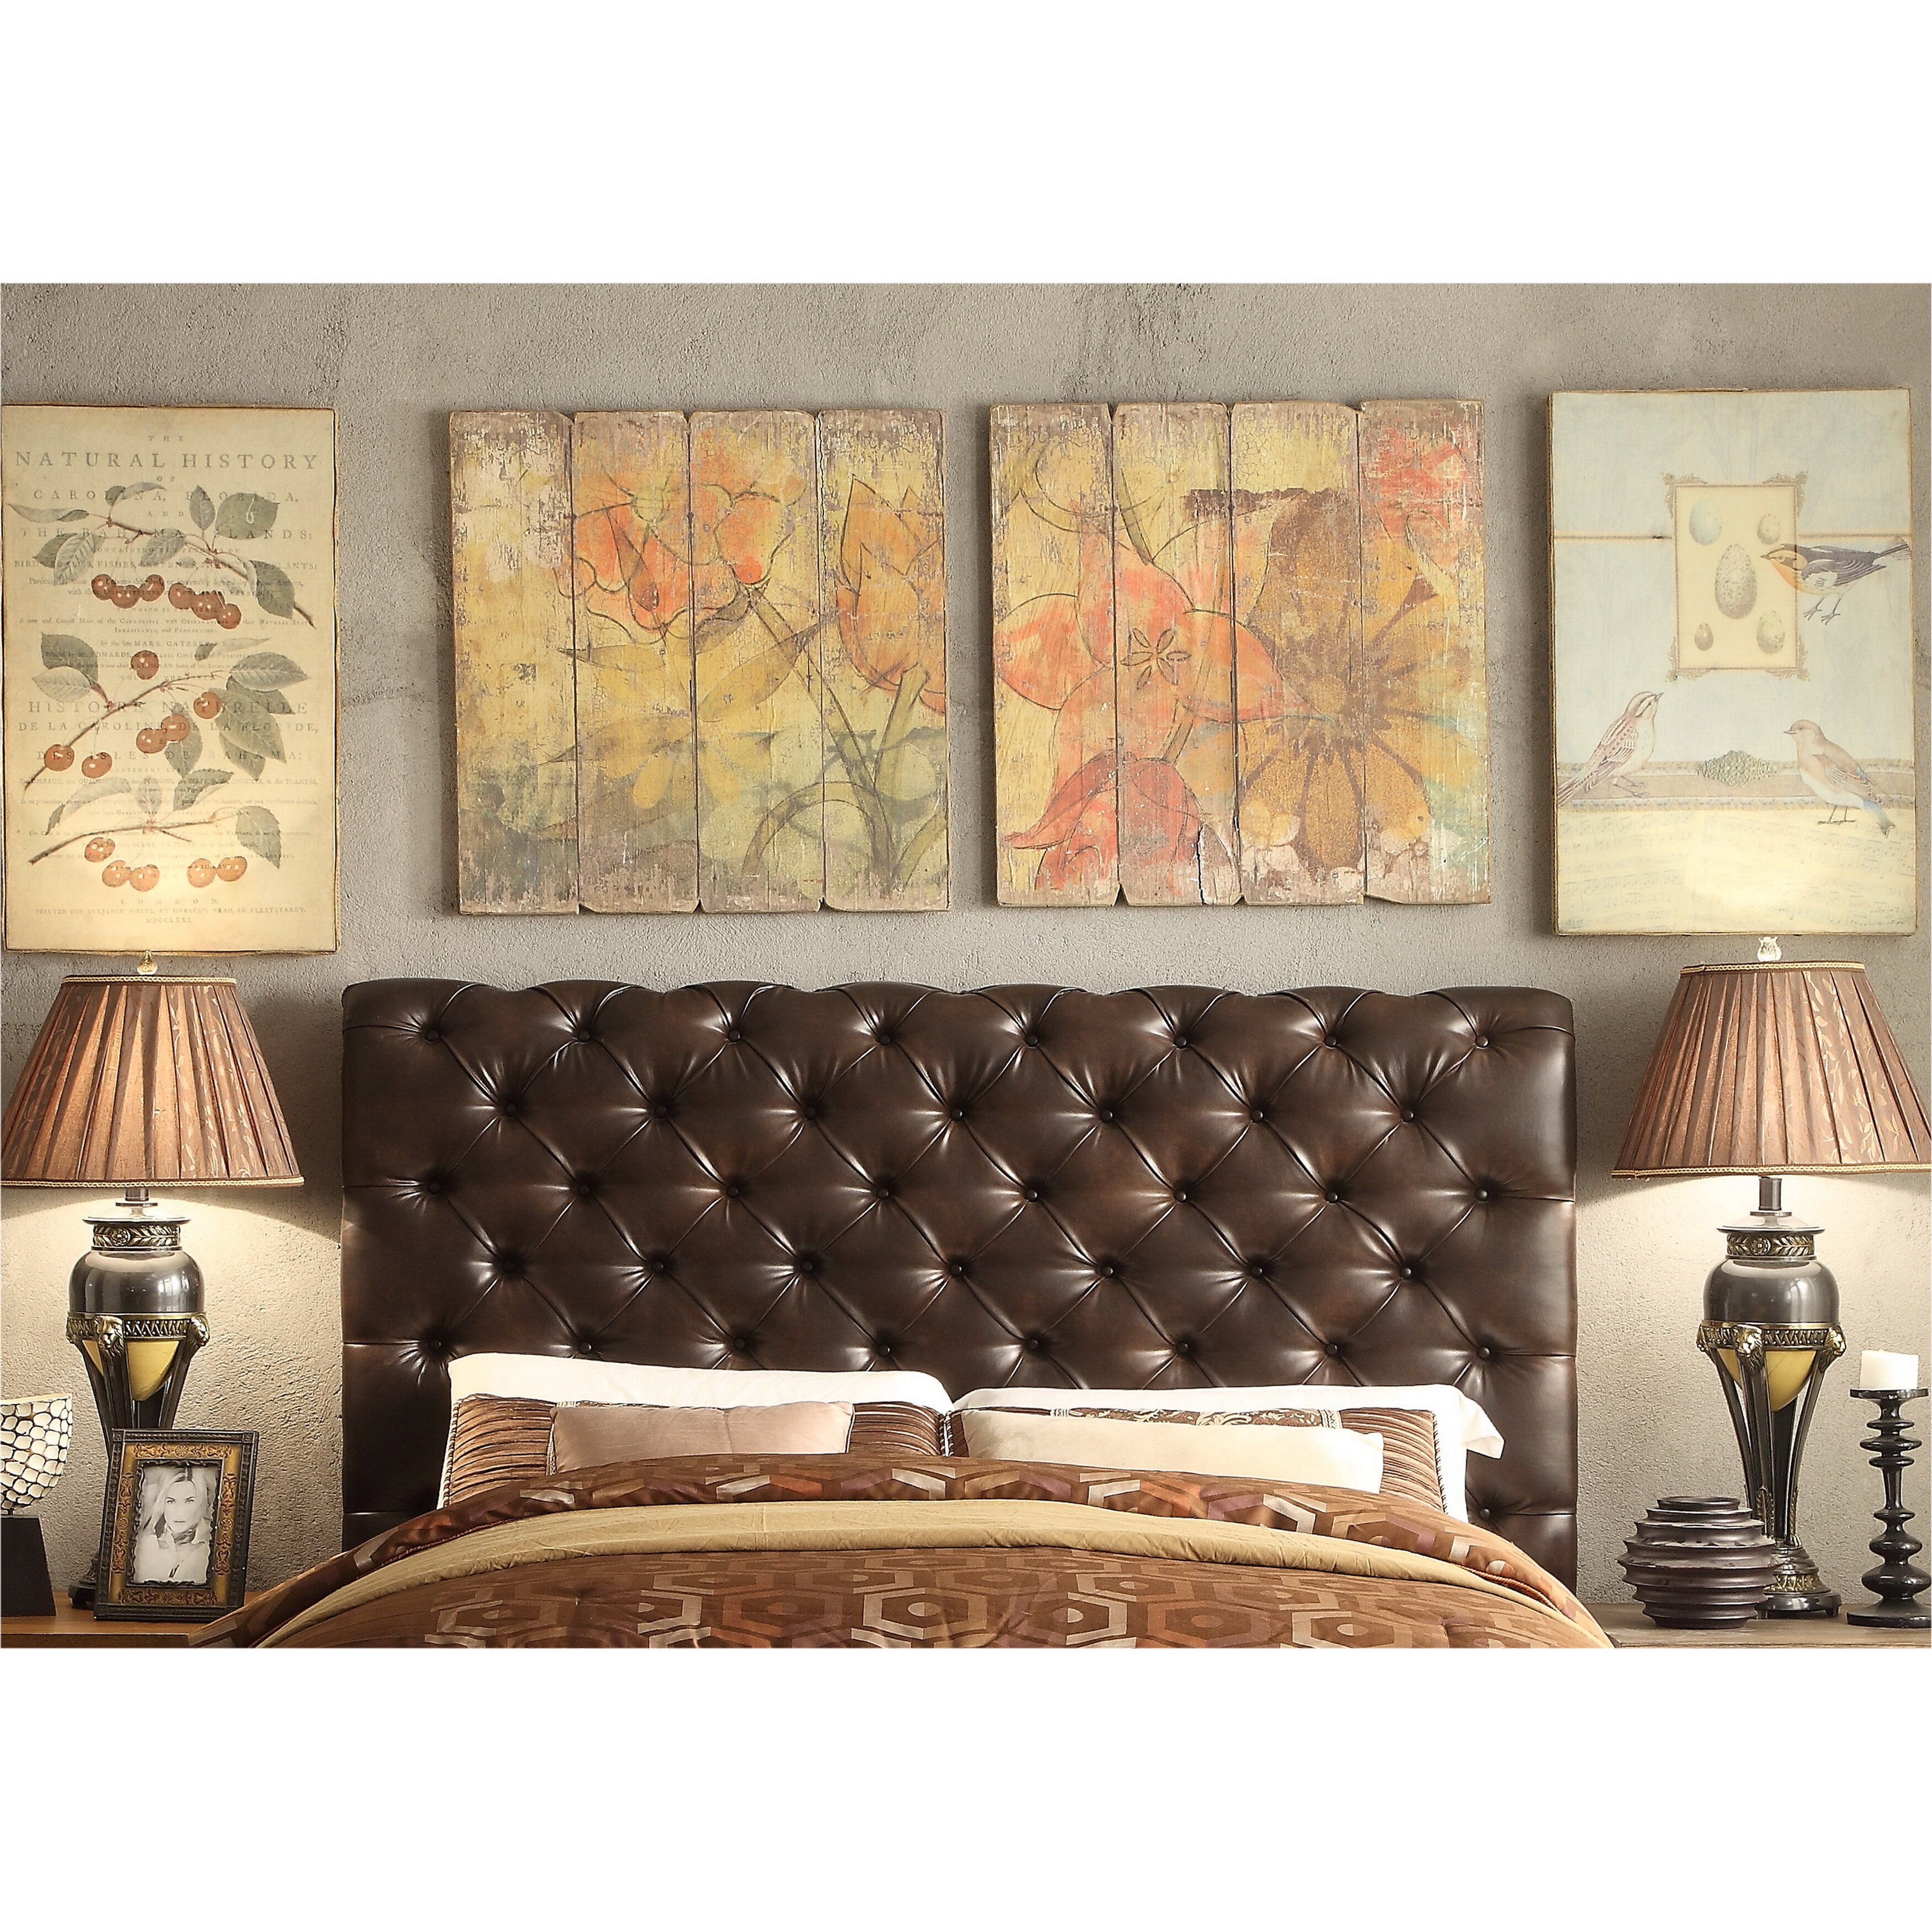 Calia King Upholstered Panel Bed